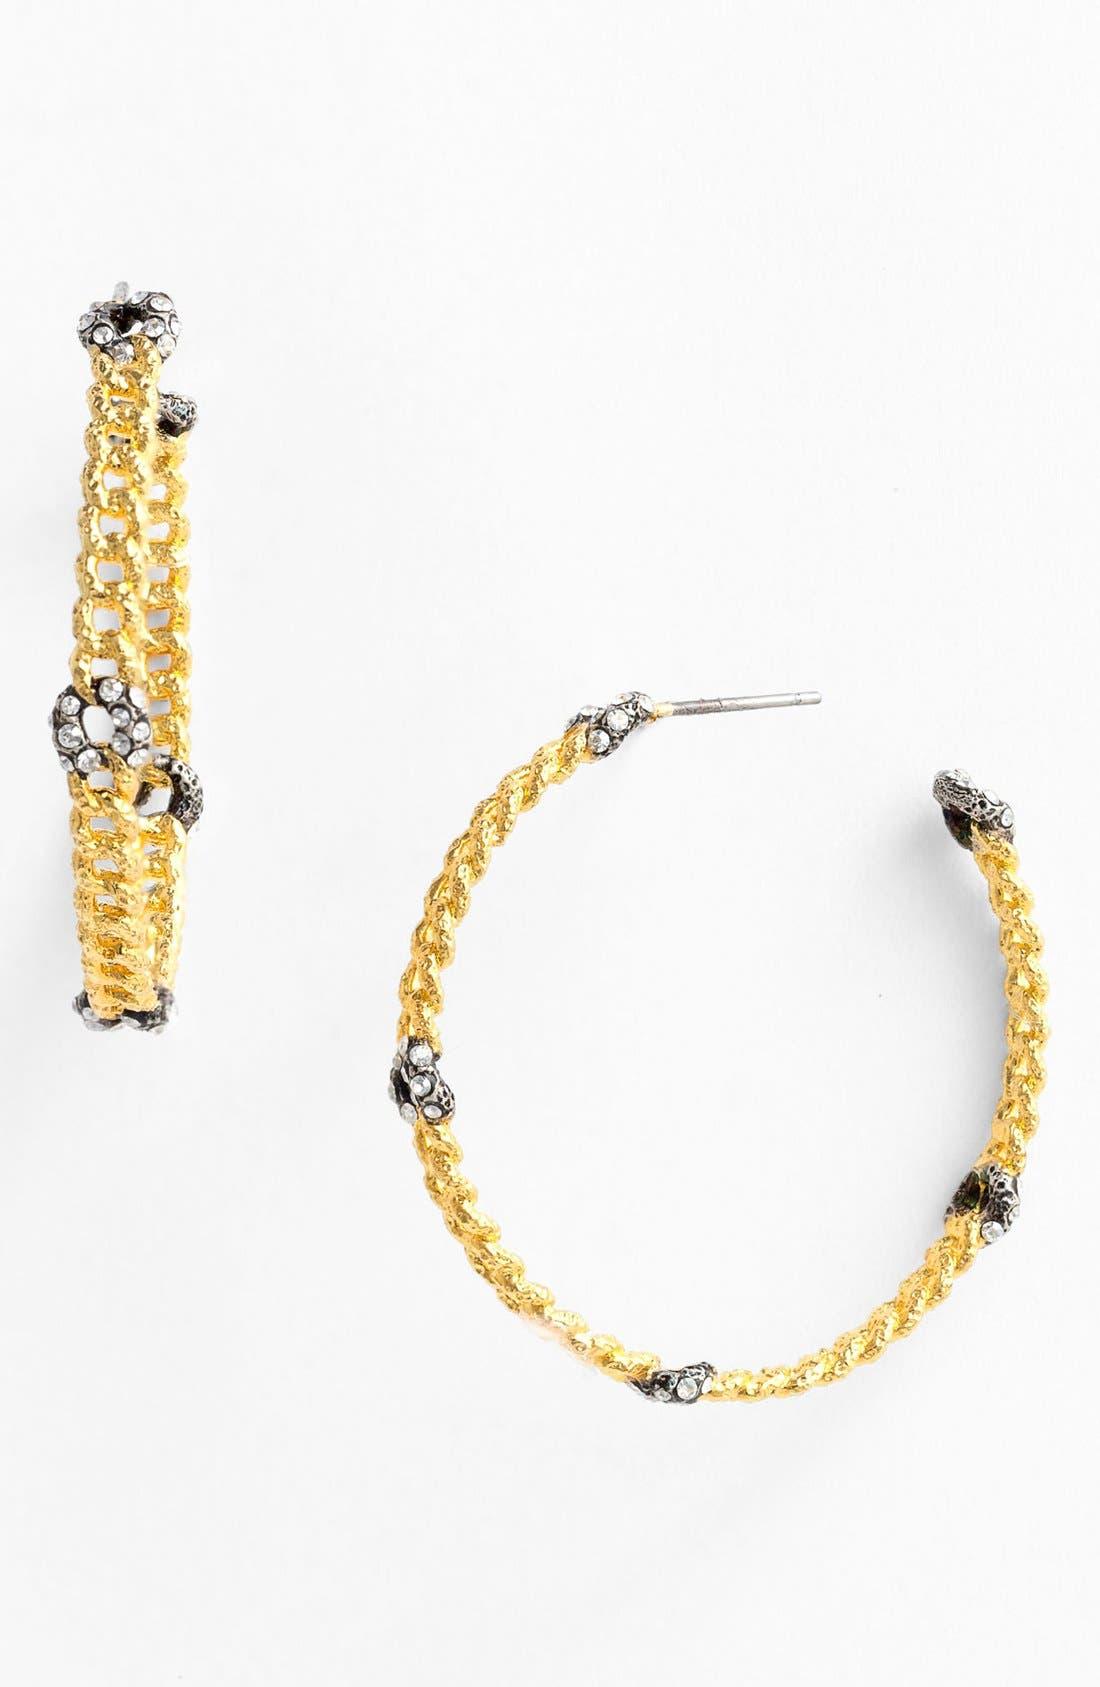 Main Image - Alexis Bittar 'Elements - Cordova' Link Hoop Earrings